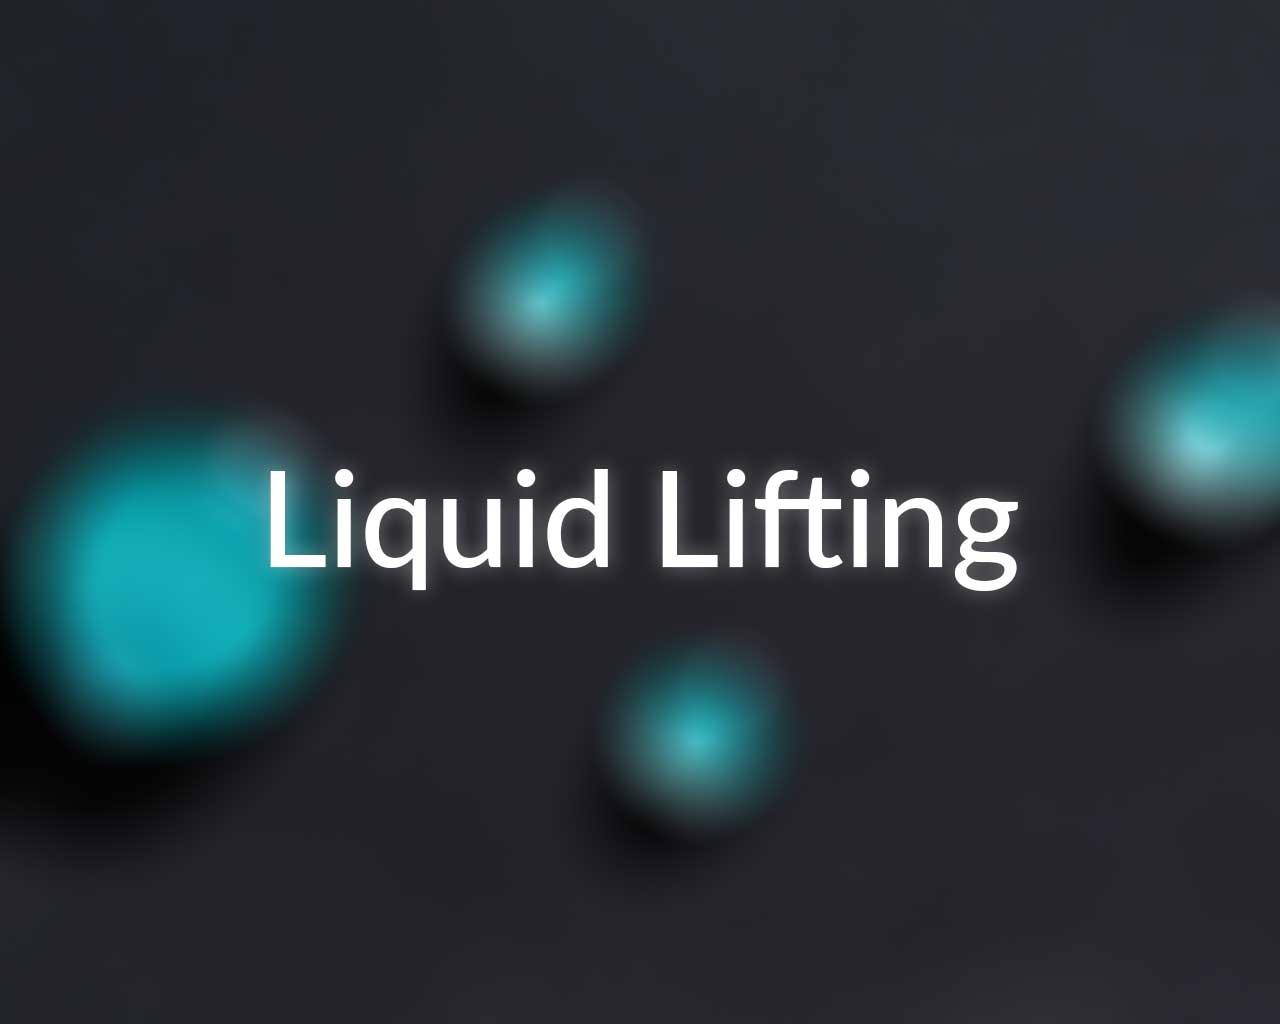 Liquid Lifting